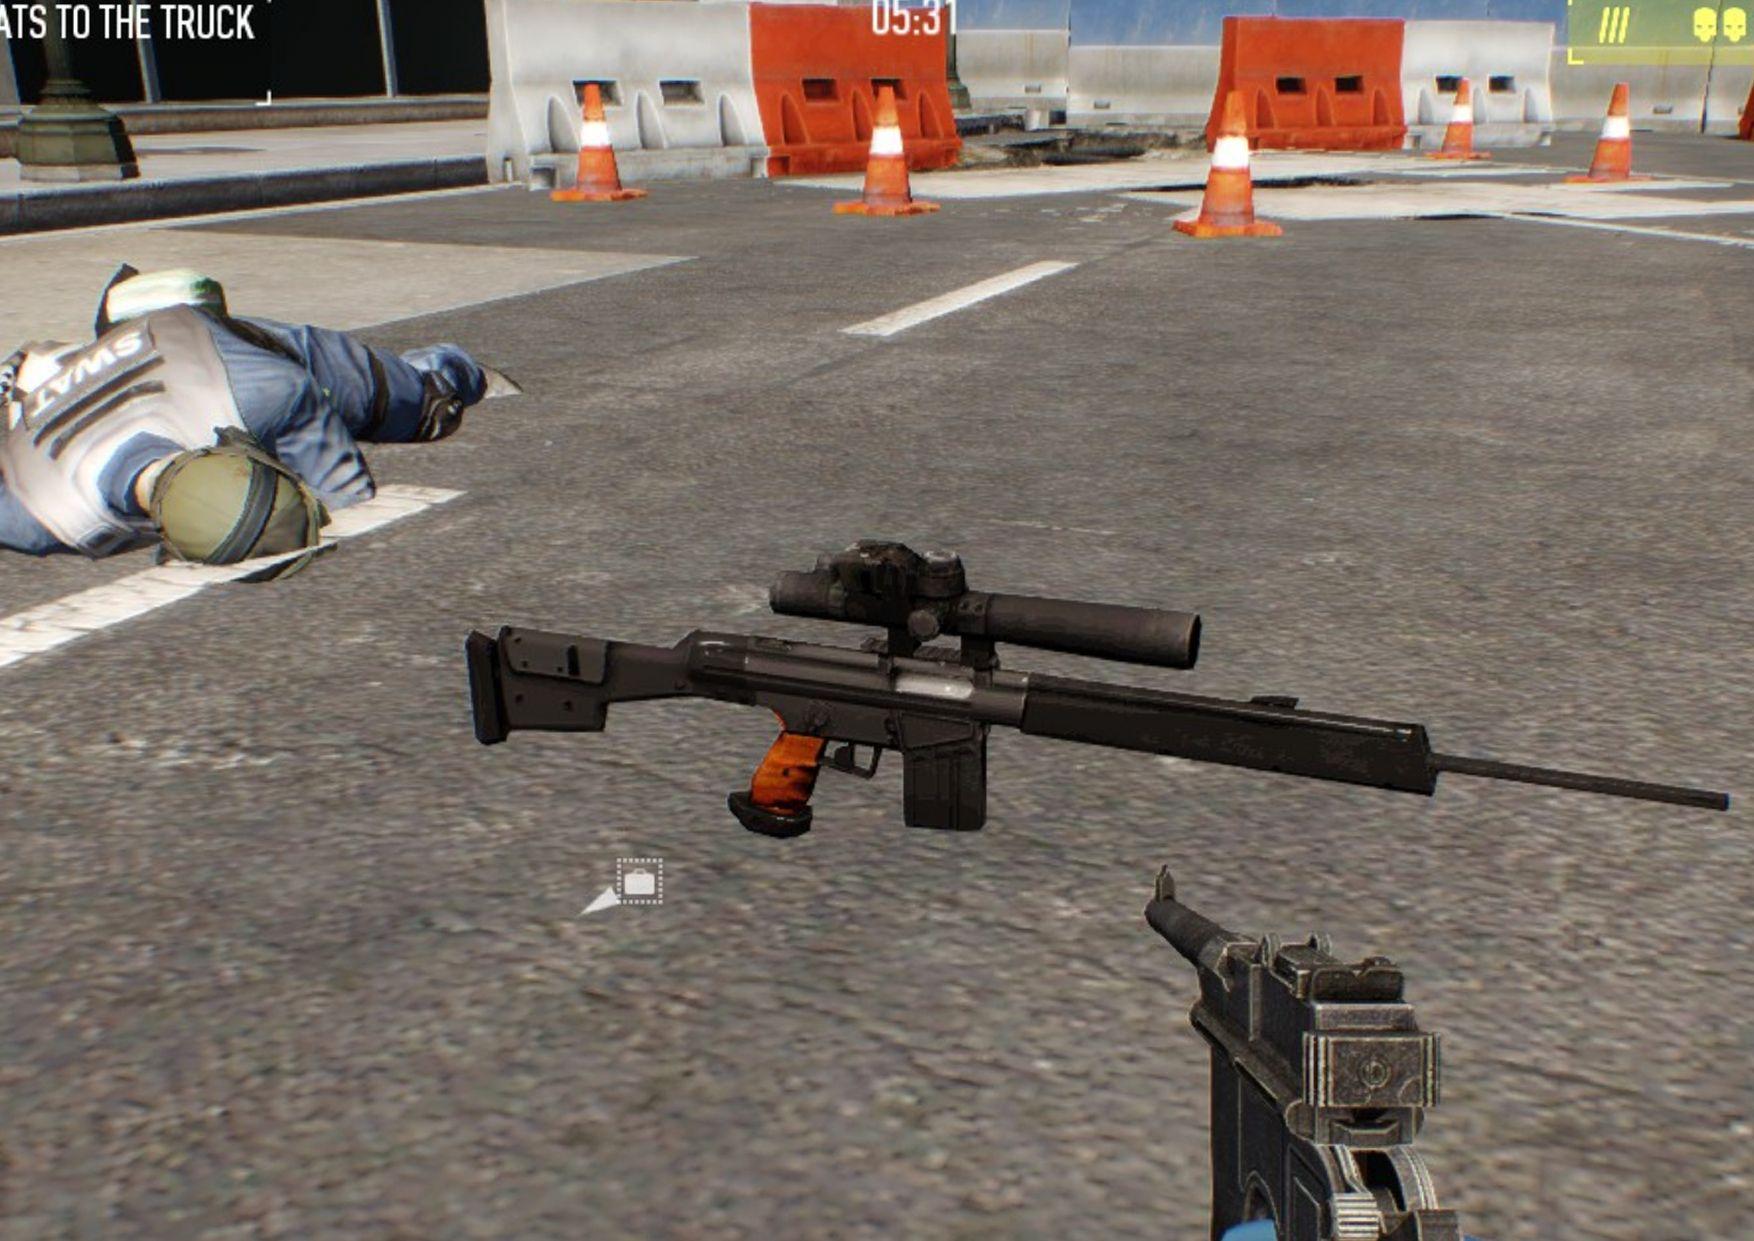 payday2_Sniper_PSG1_2.jpg